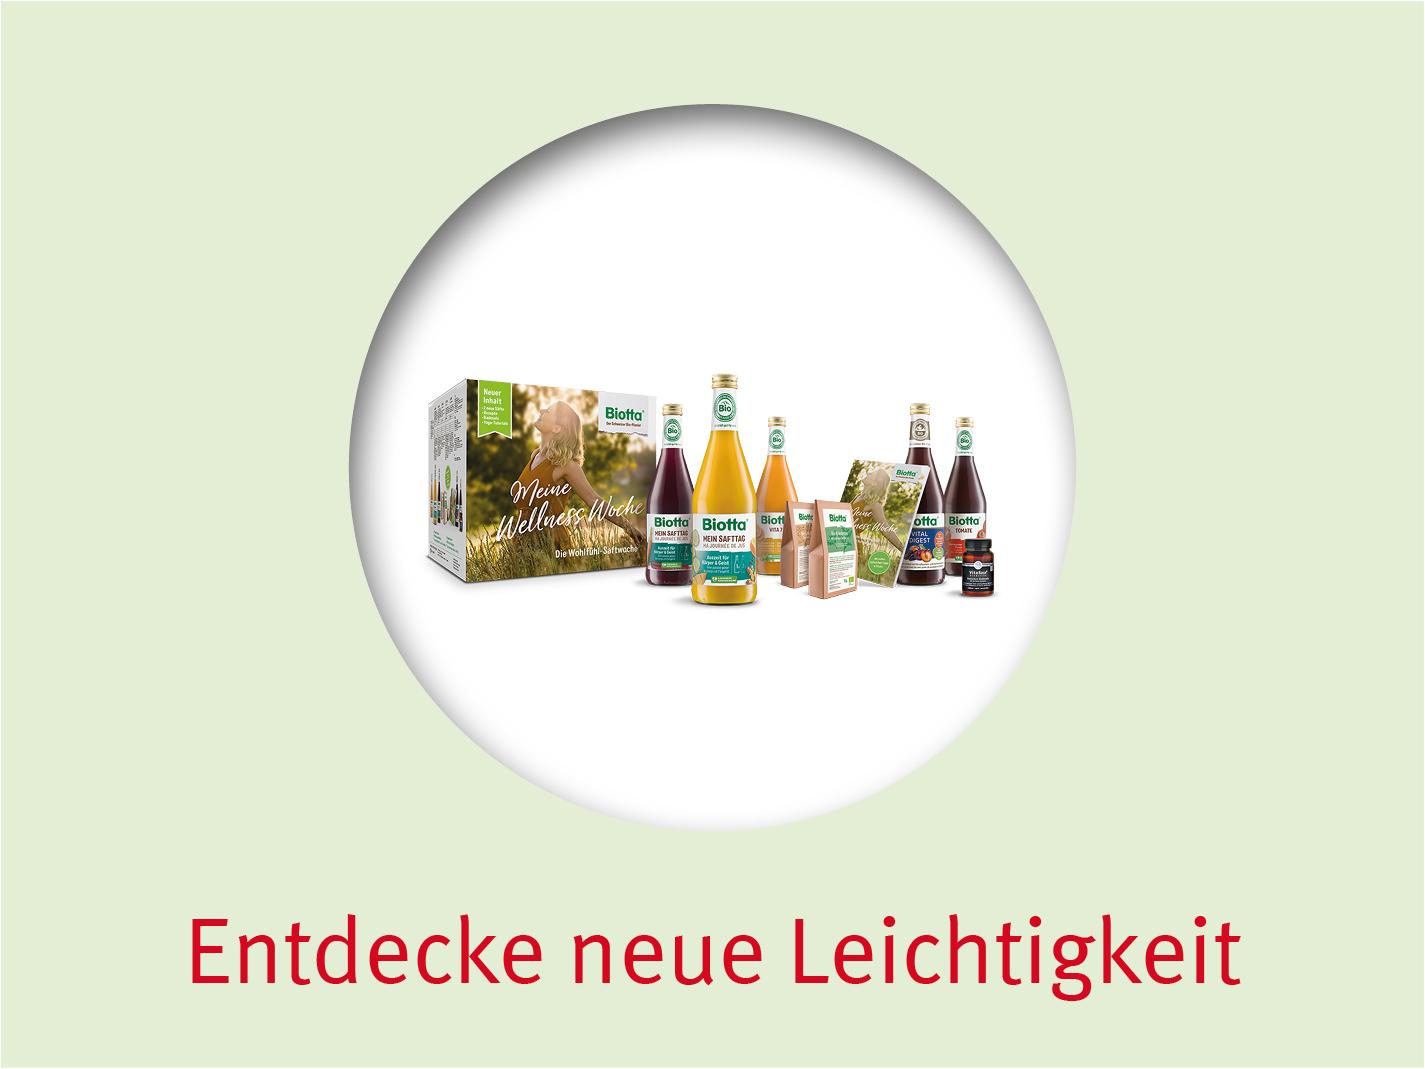 teaserbox_biotta_wellnesswoche_tp_homepage.jpg